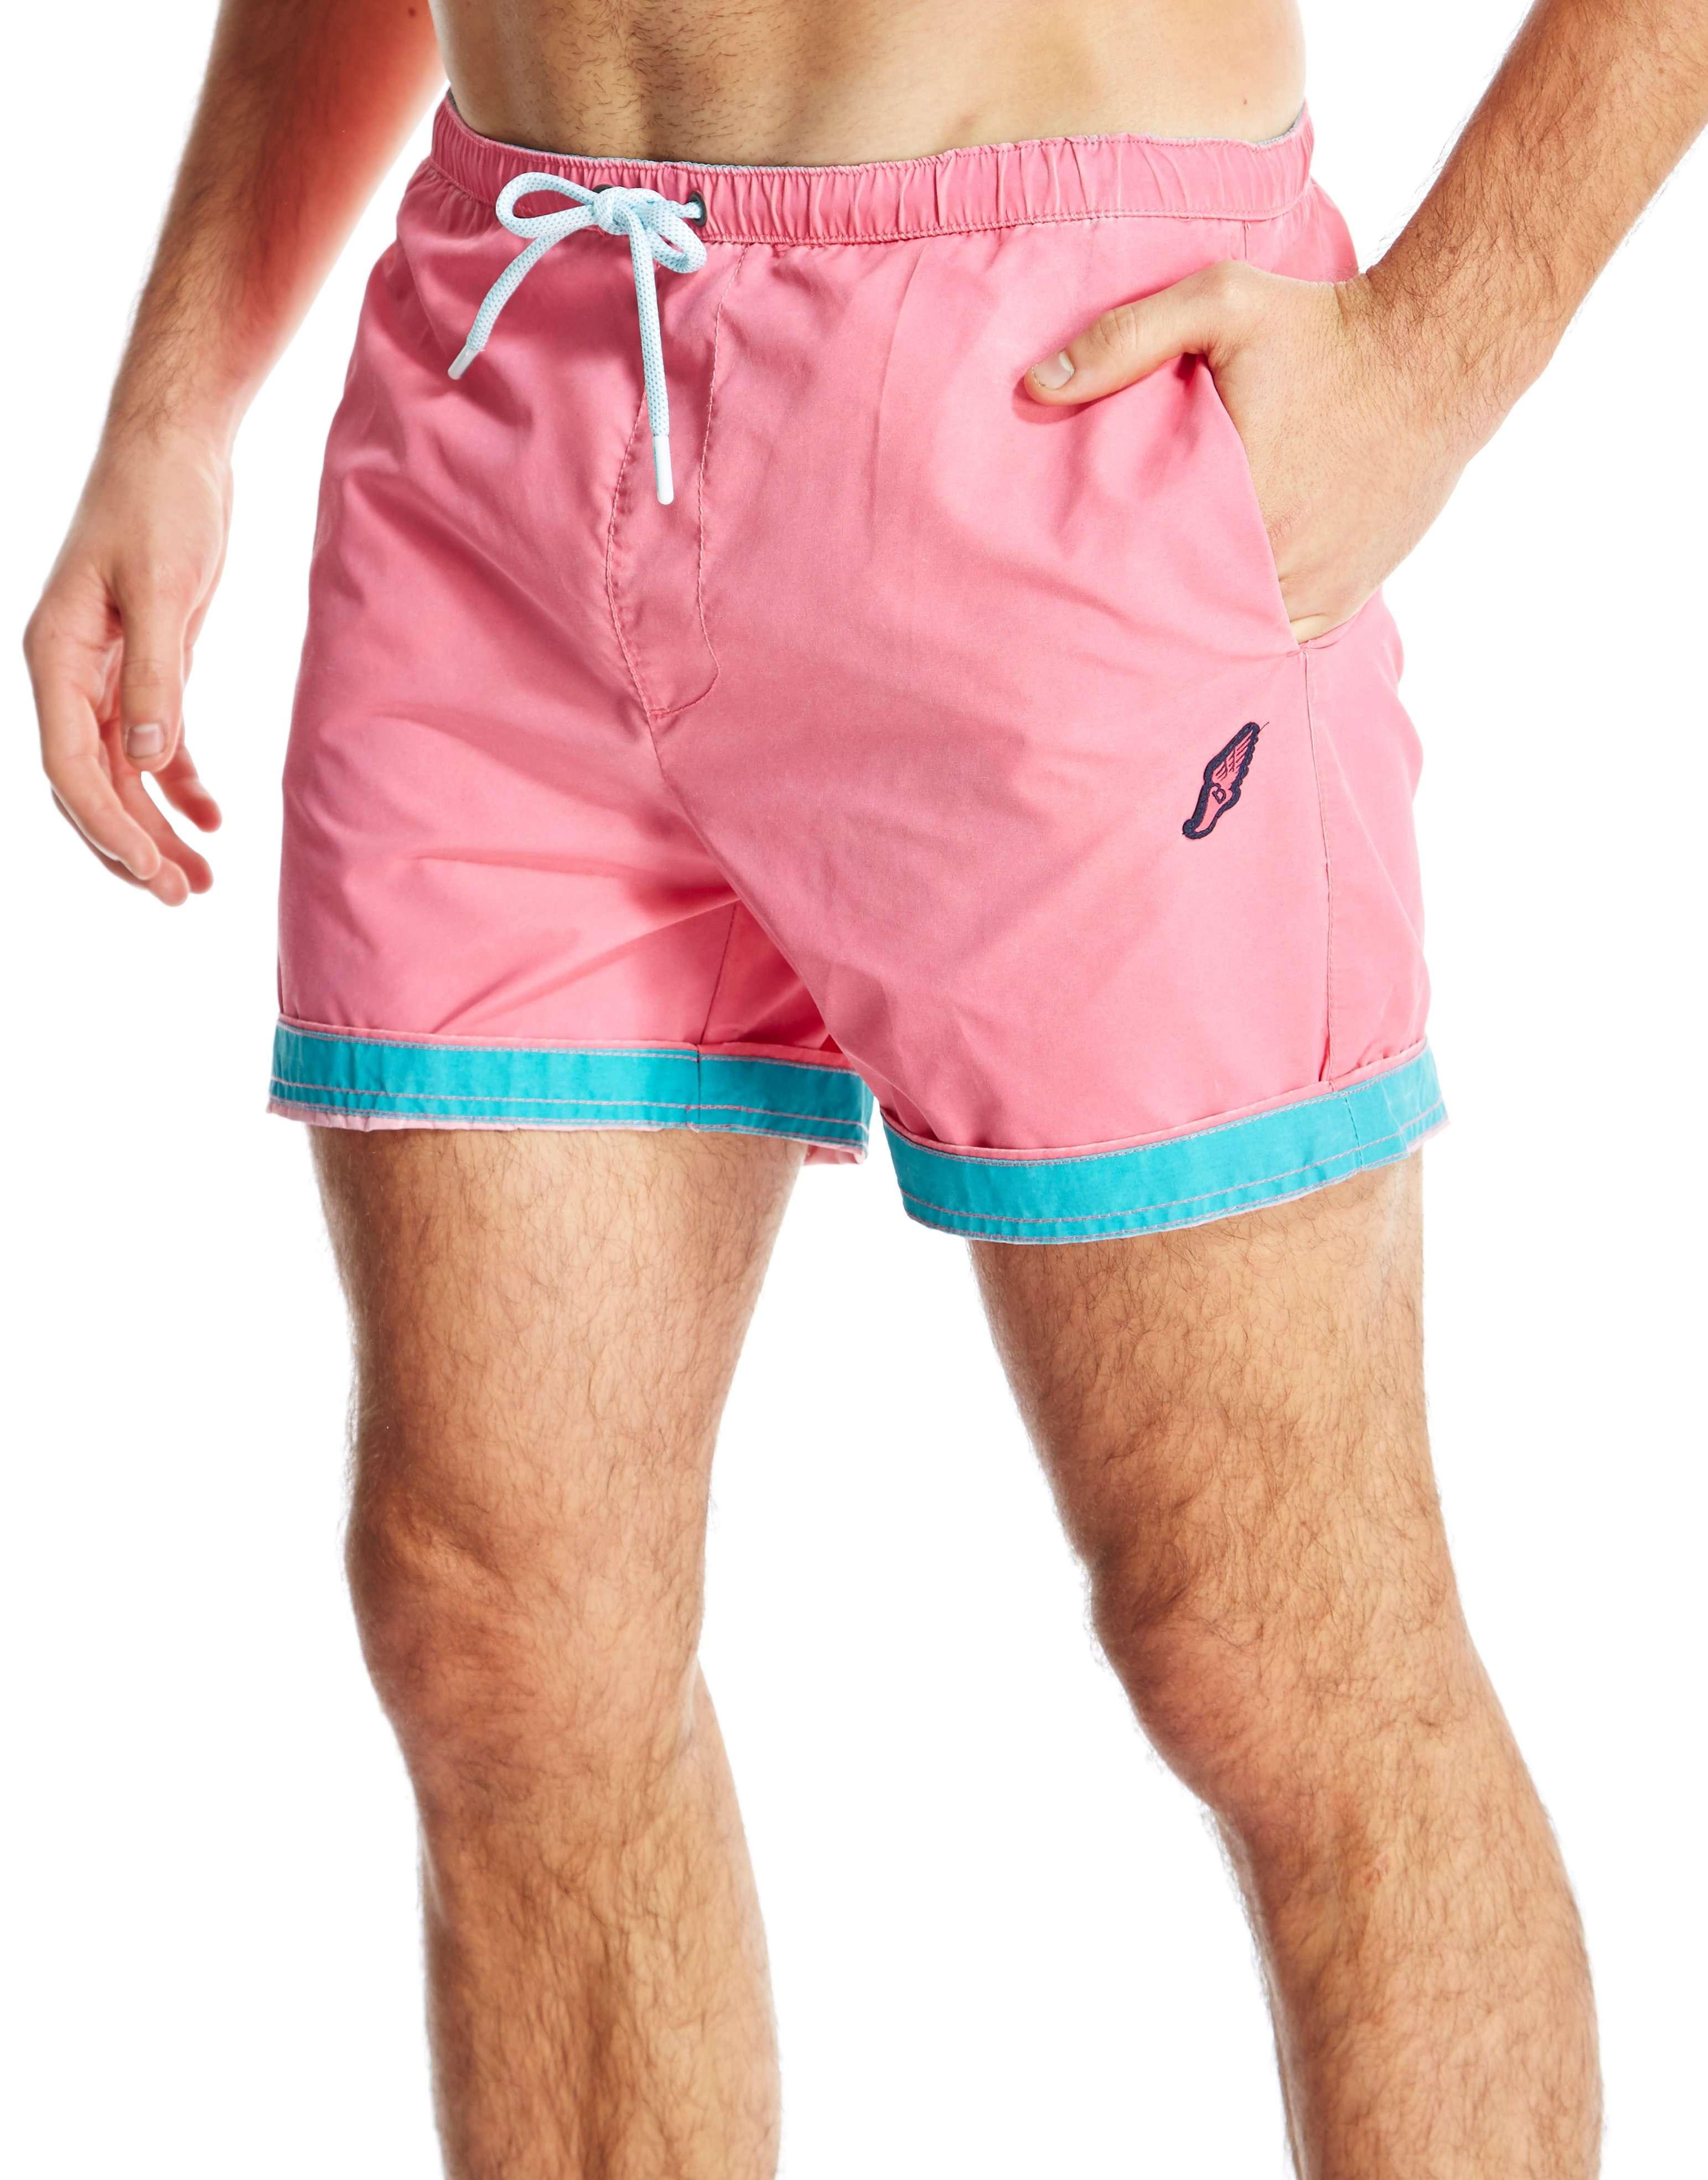 erotiska underkläder sverige matcher